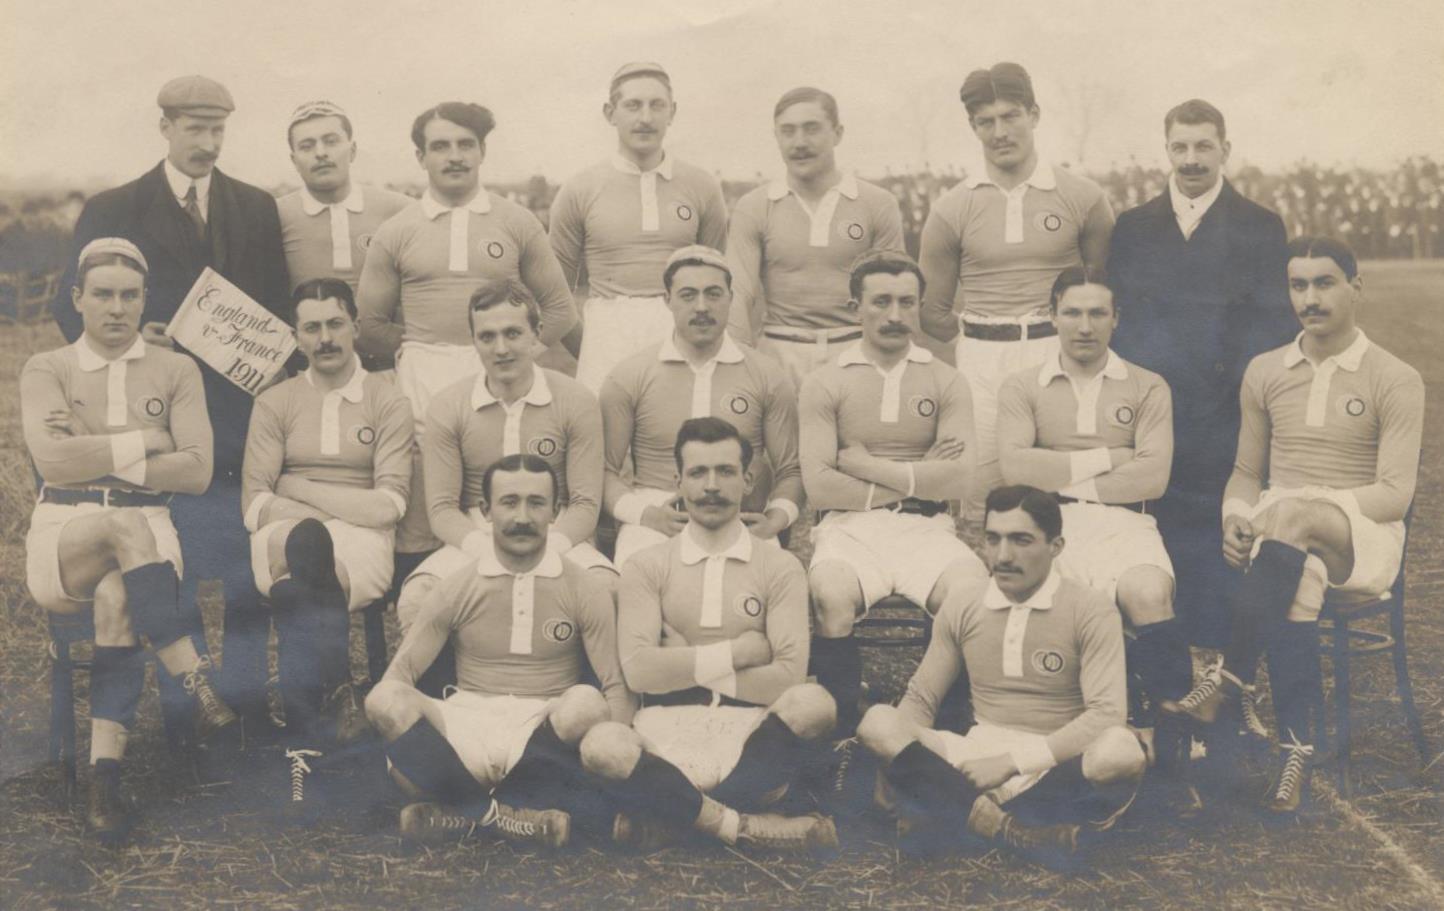 1911 France team